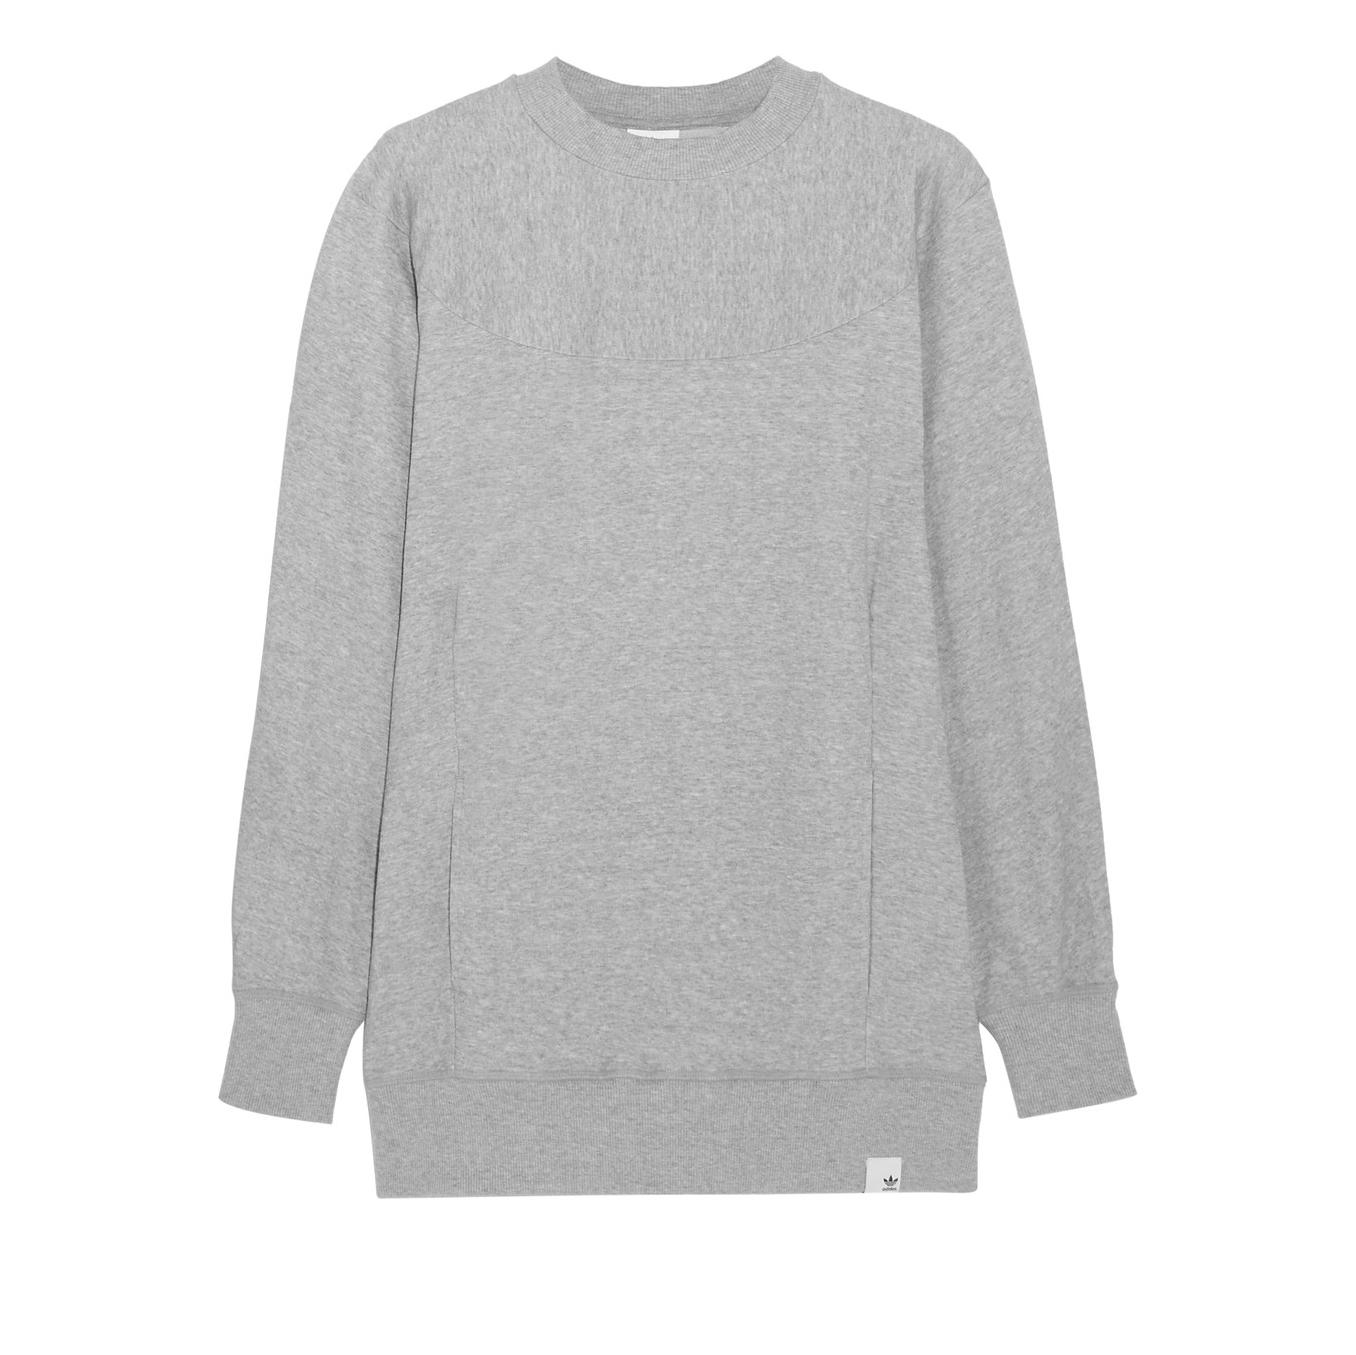 ADIDAS ORIGINALS XbyO cotton-jersey sweatshirt